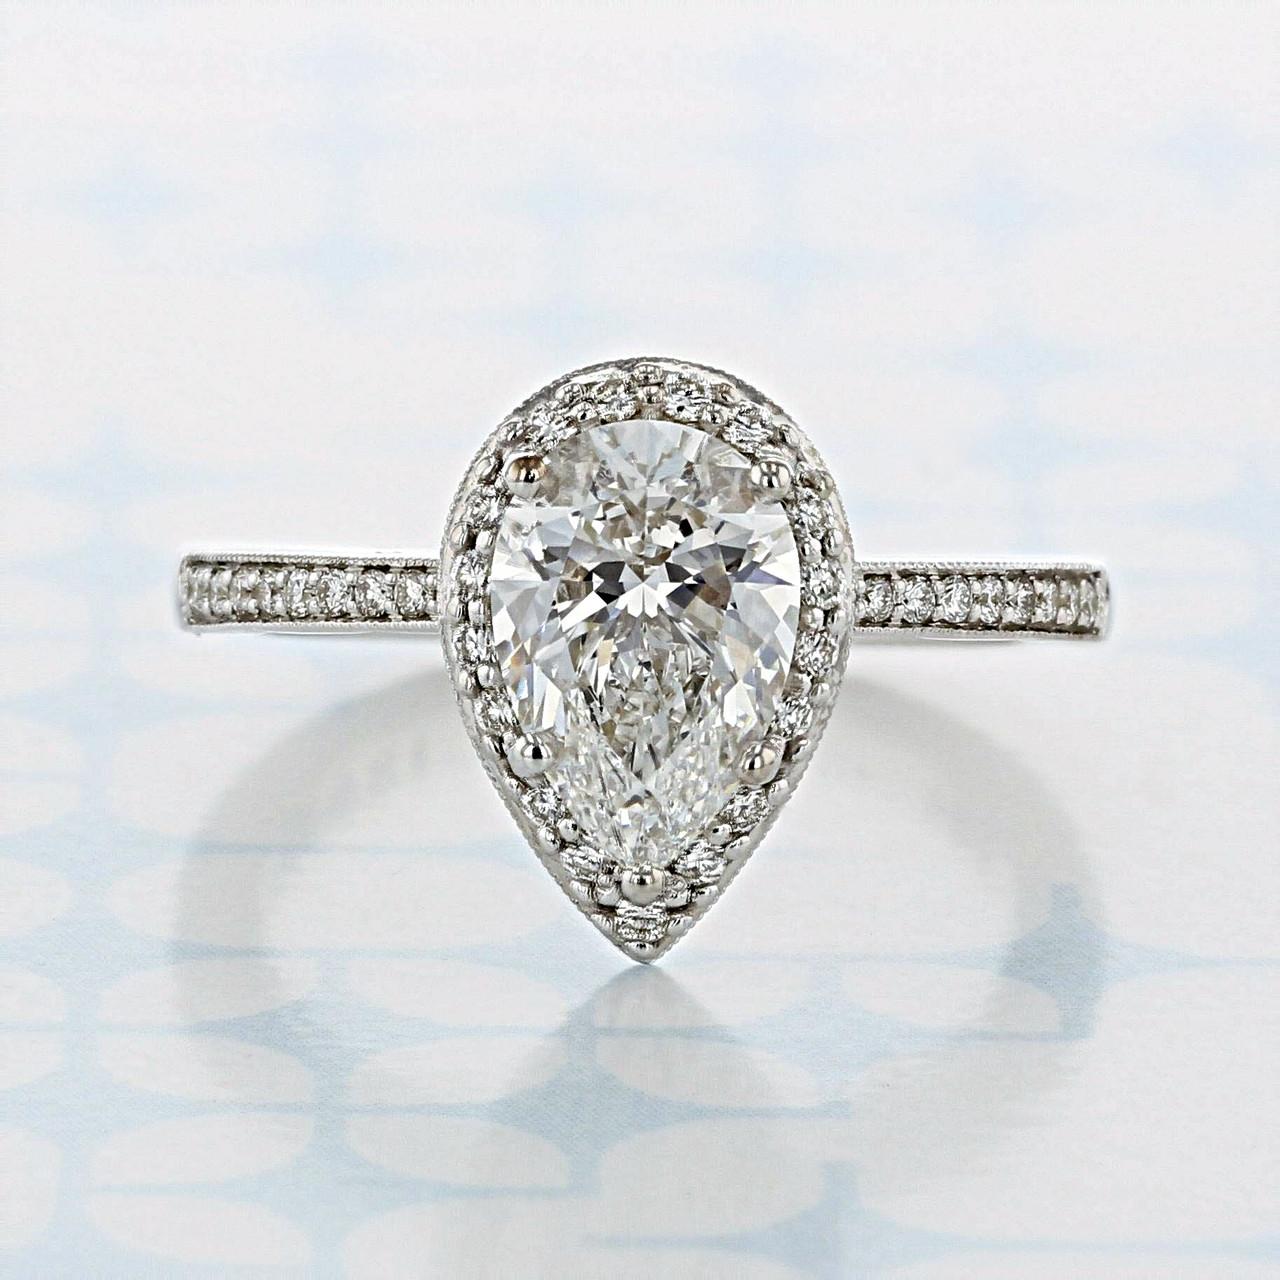 Tacori Coastal Crescent Pear Shape Diamond Engagement Ring 2006861 Icing On The Ring